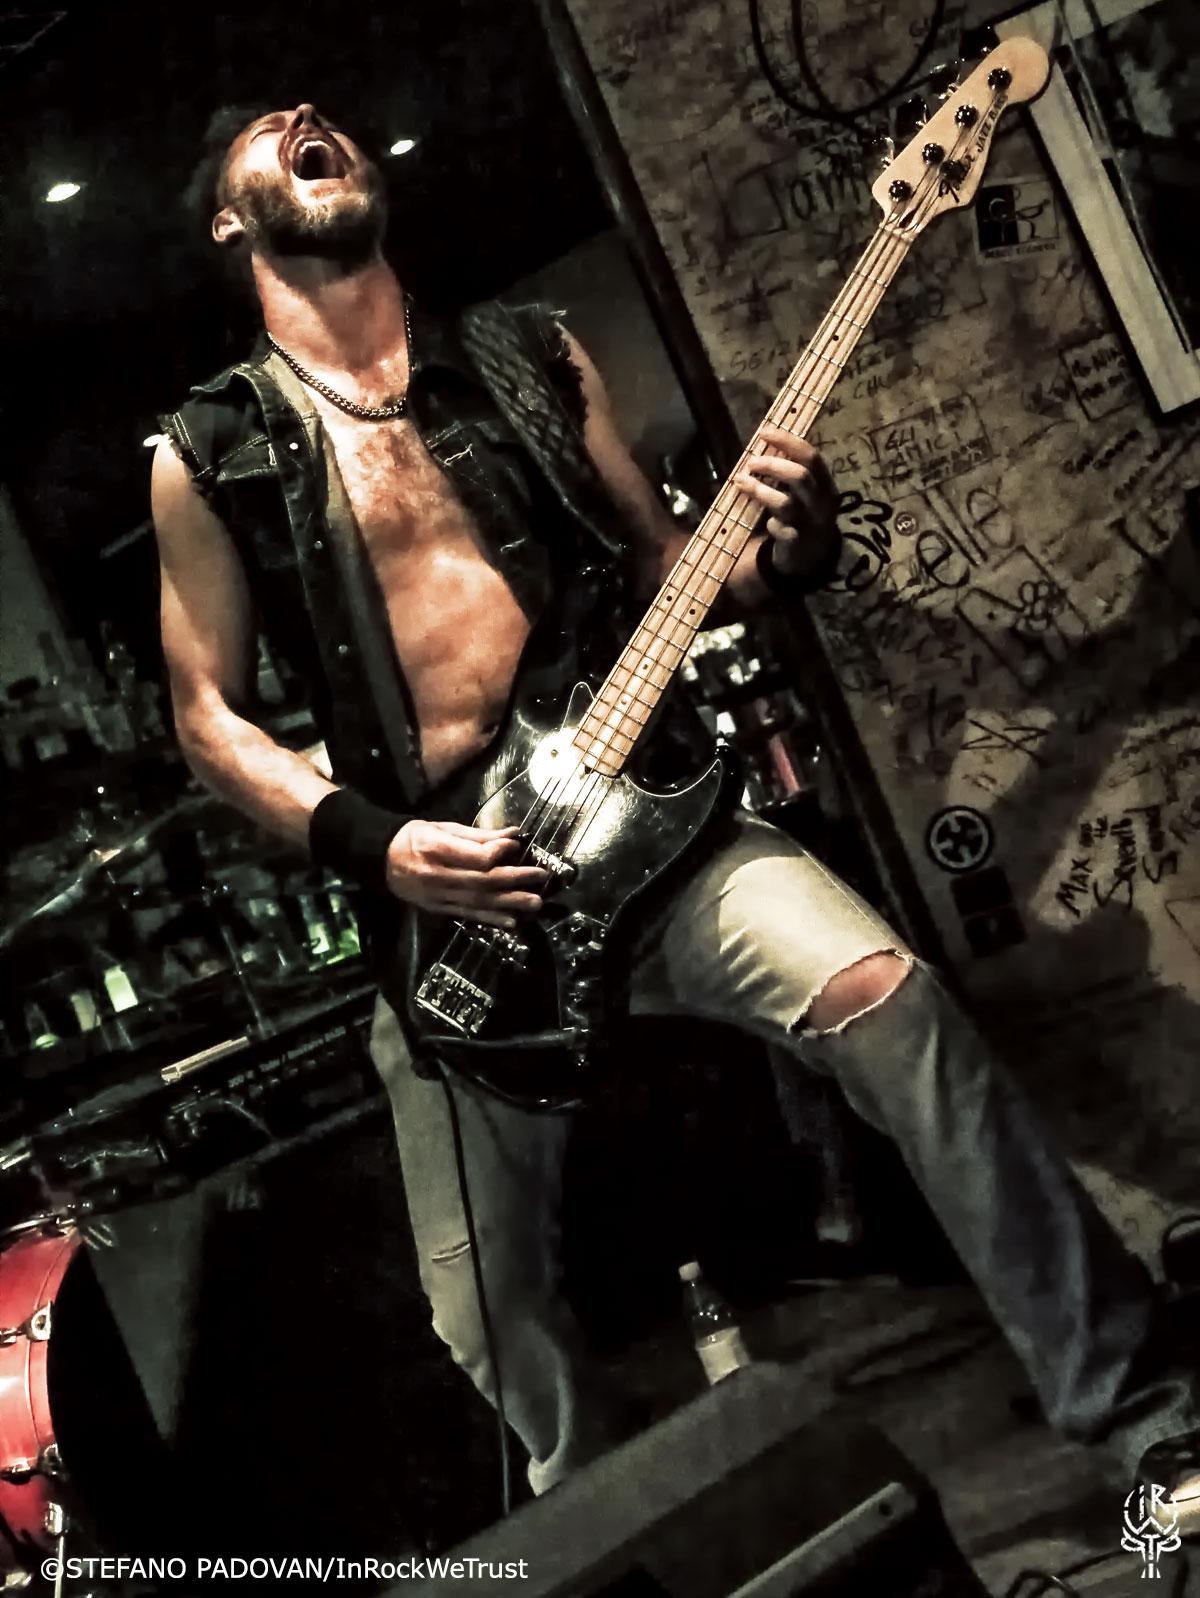 Dave-Dark-Lord-Vapore1